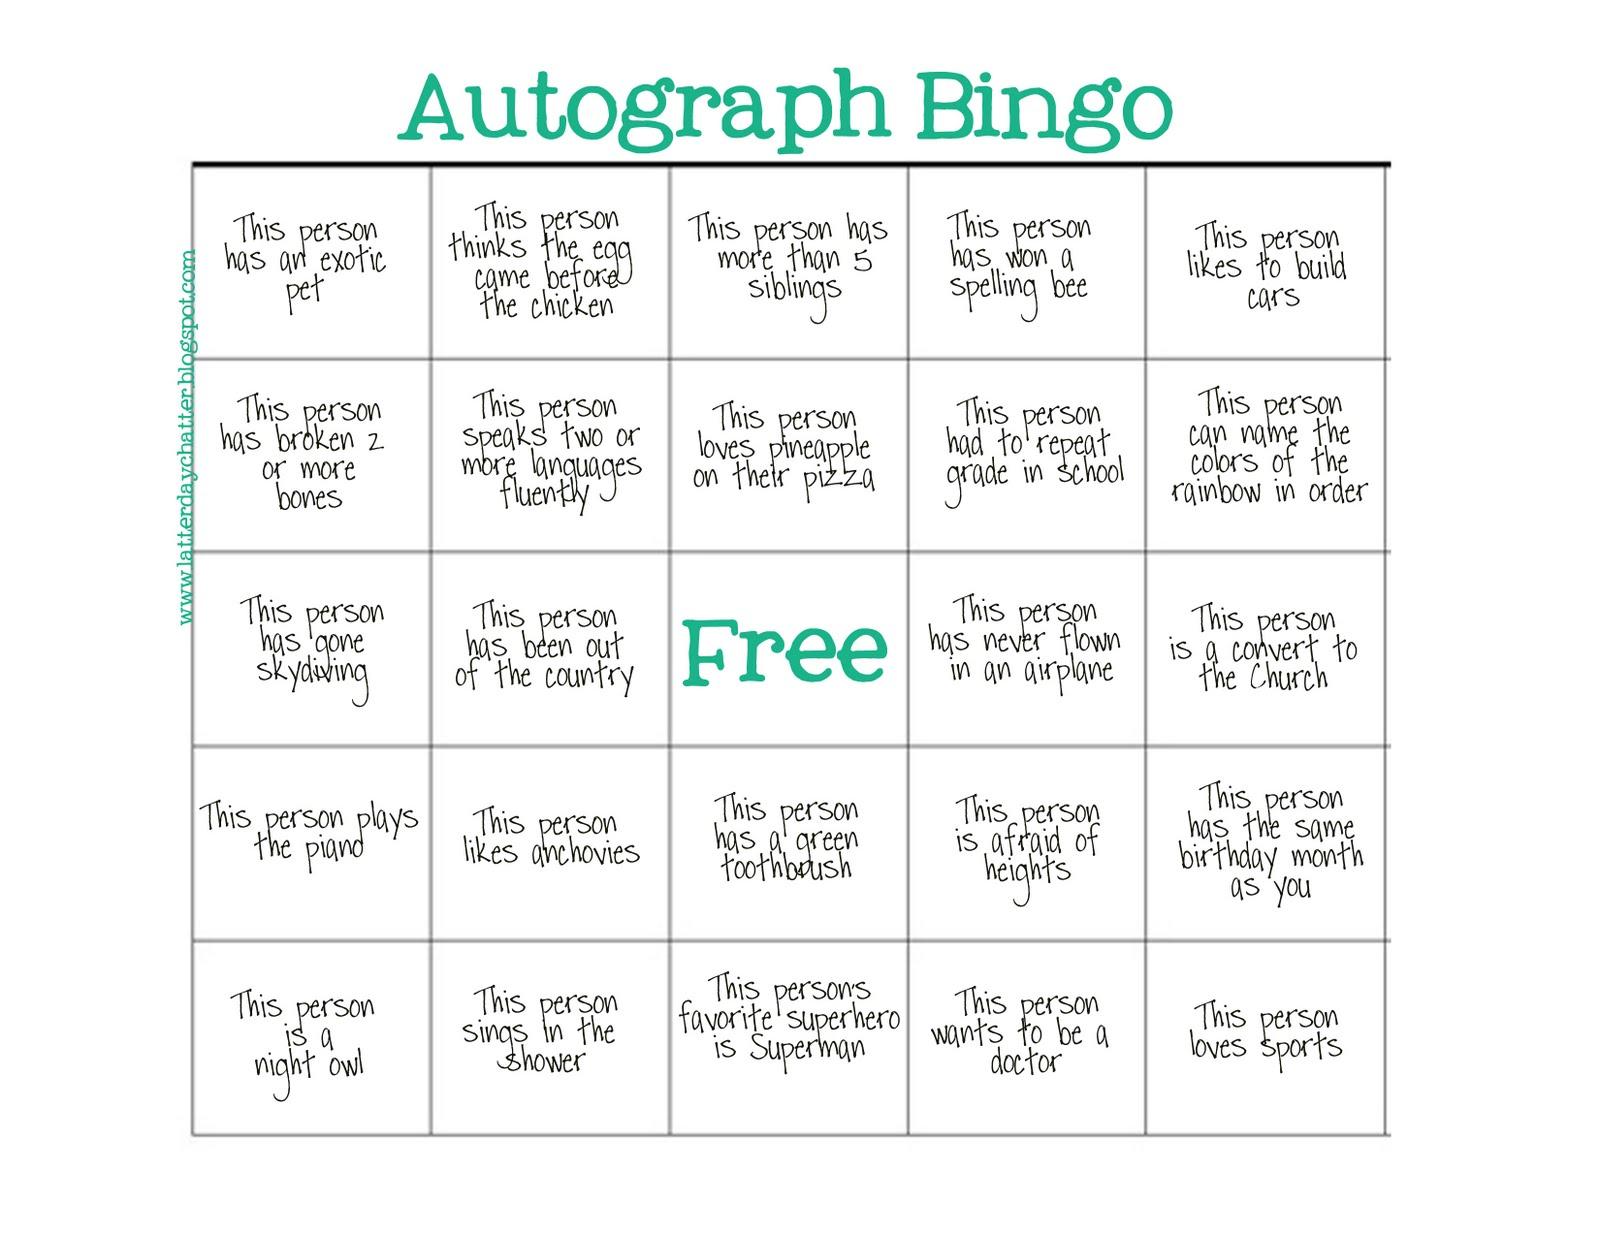 Autograph game questions